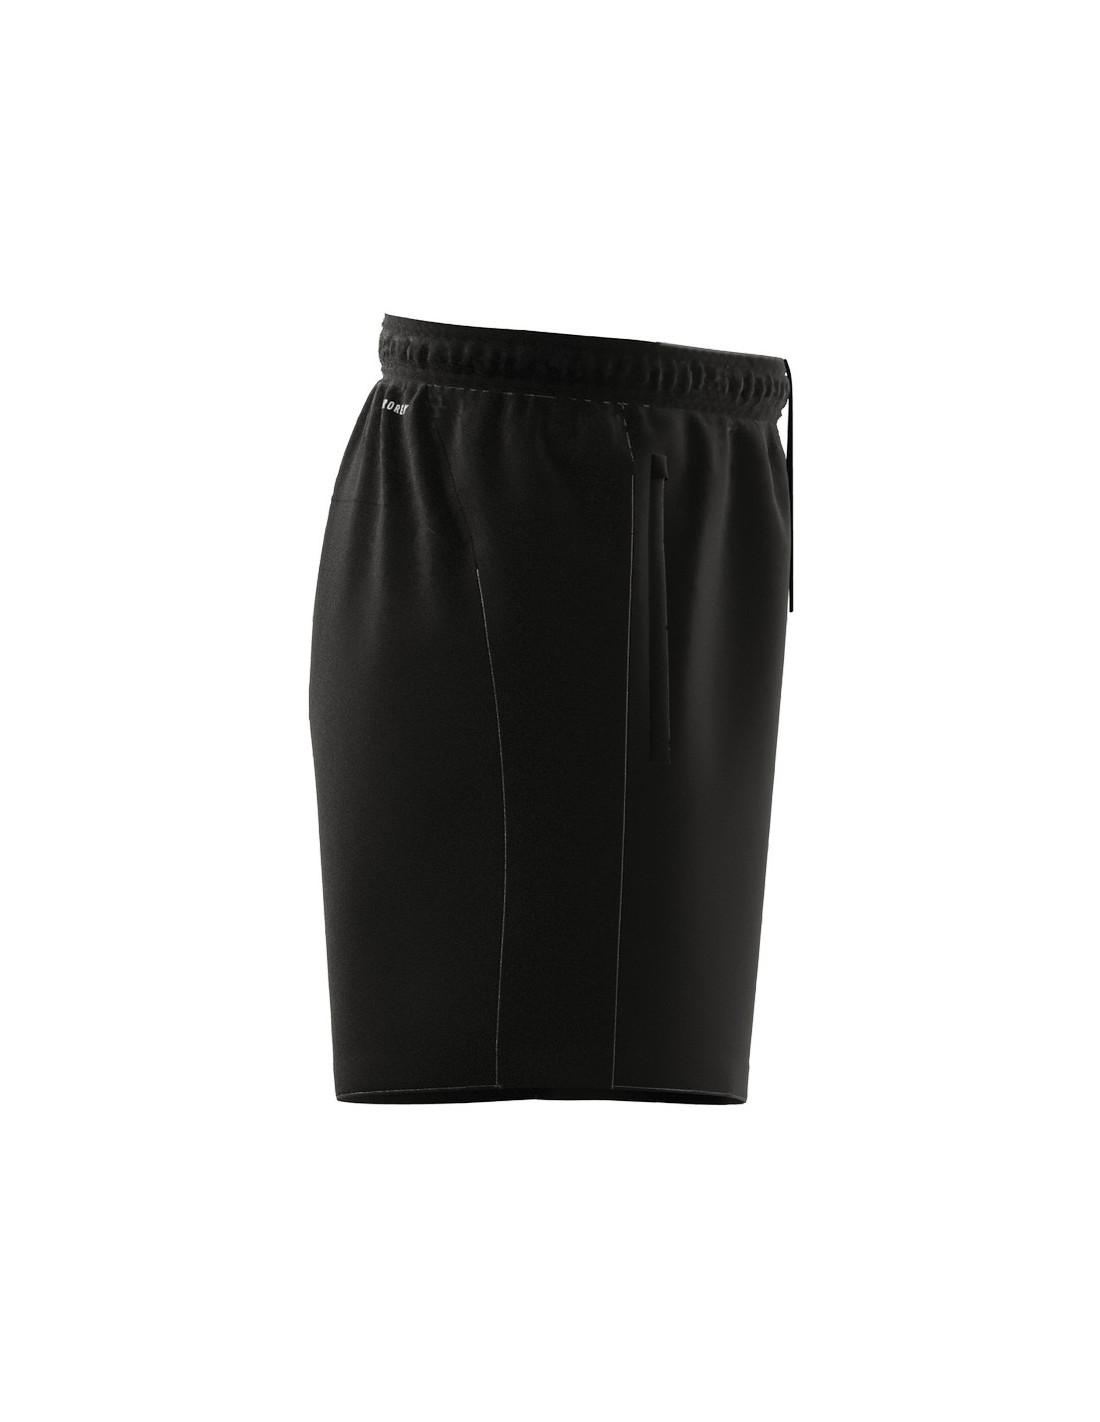 outlet store 96886 31e75 ... Botas futbol ADIDAS MESSI 16.3 AG J AZUI